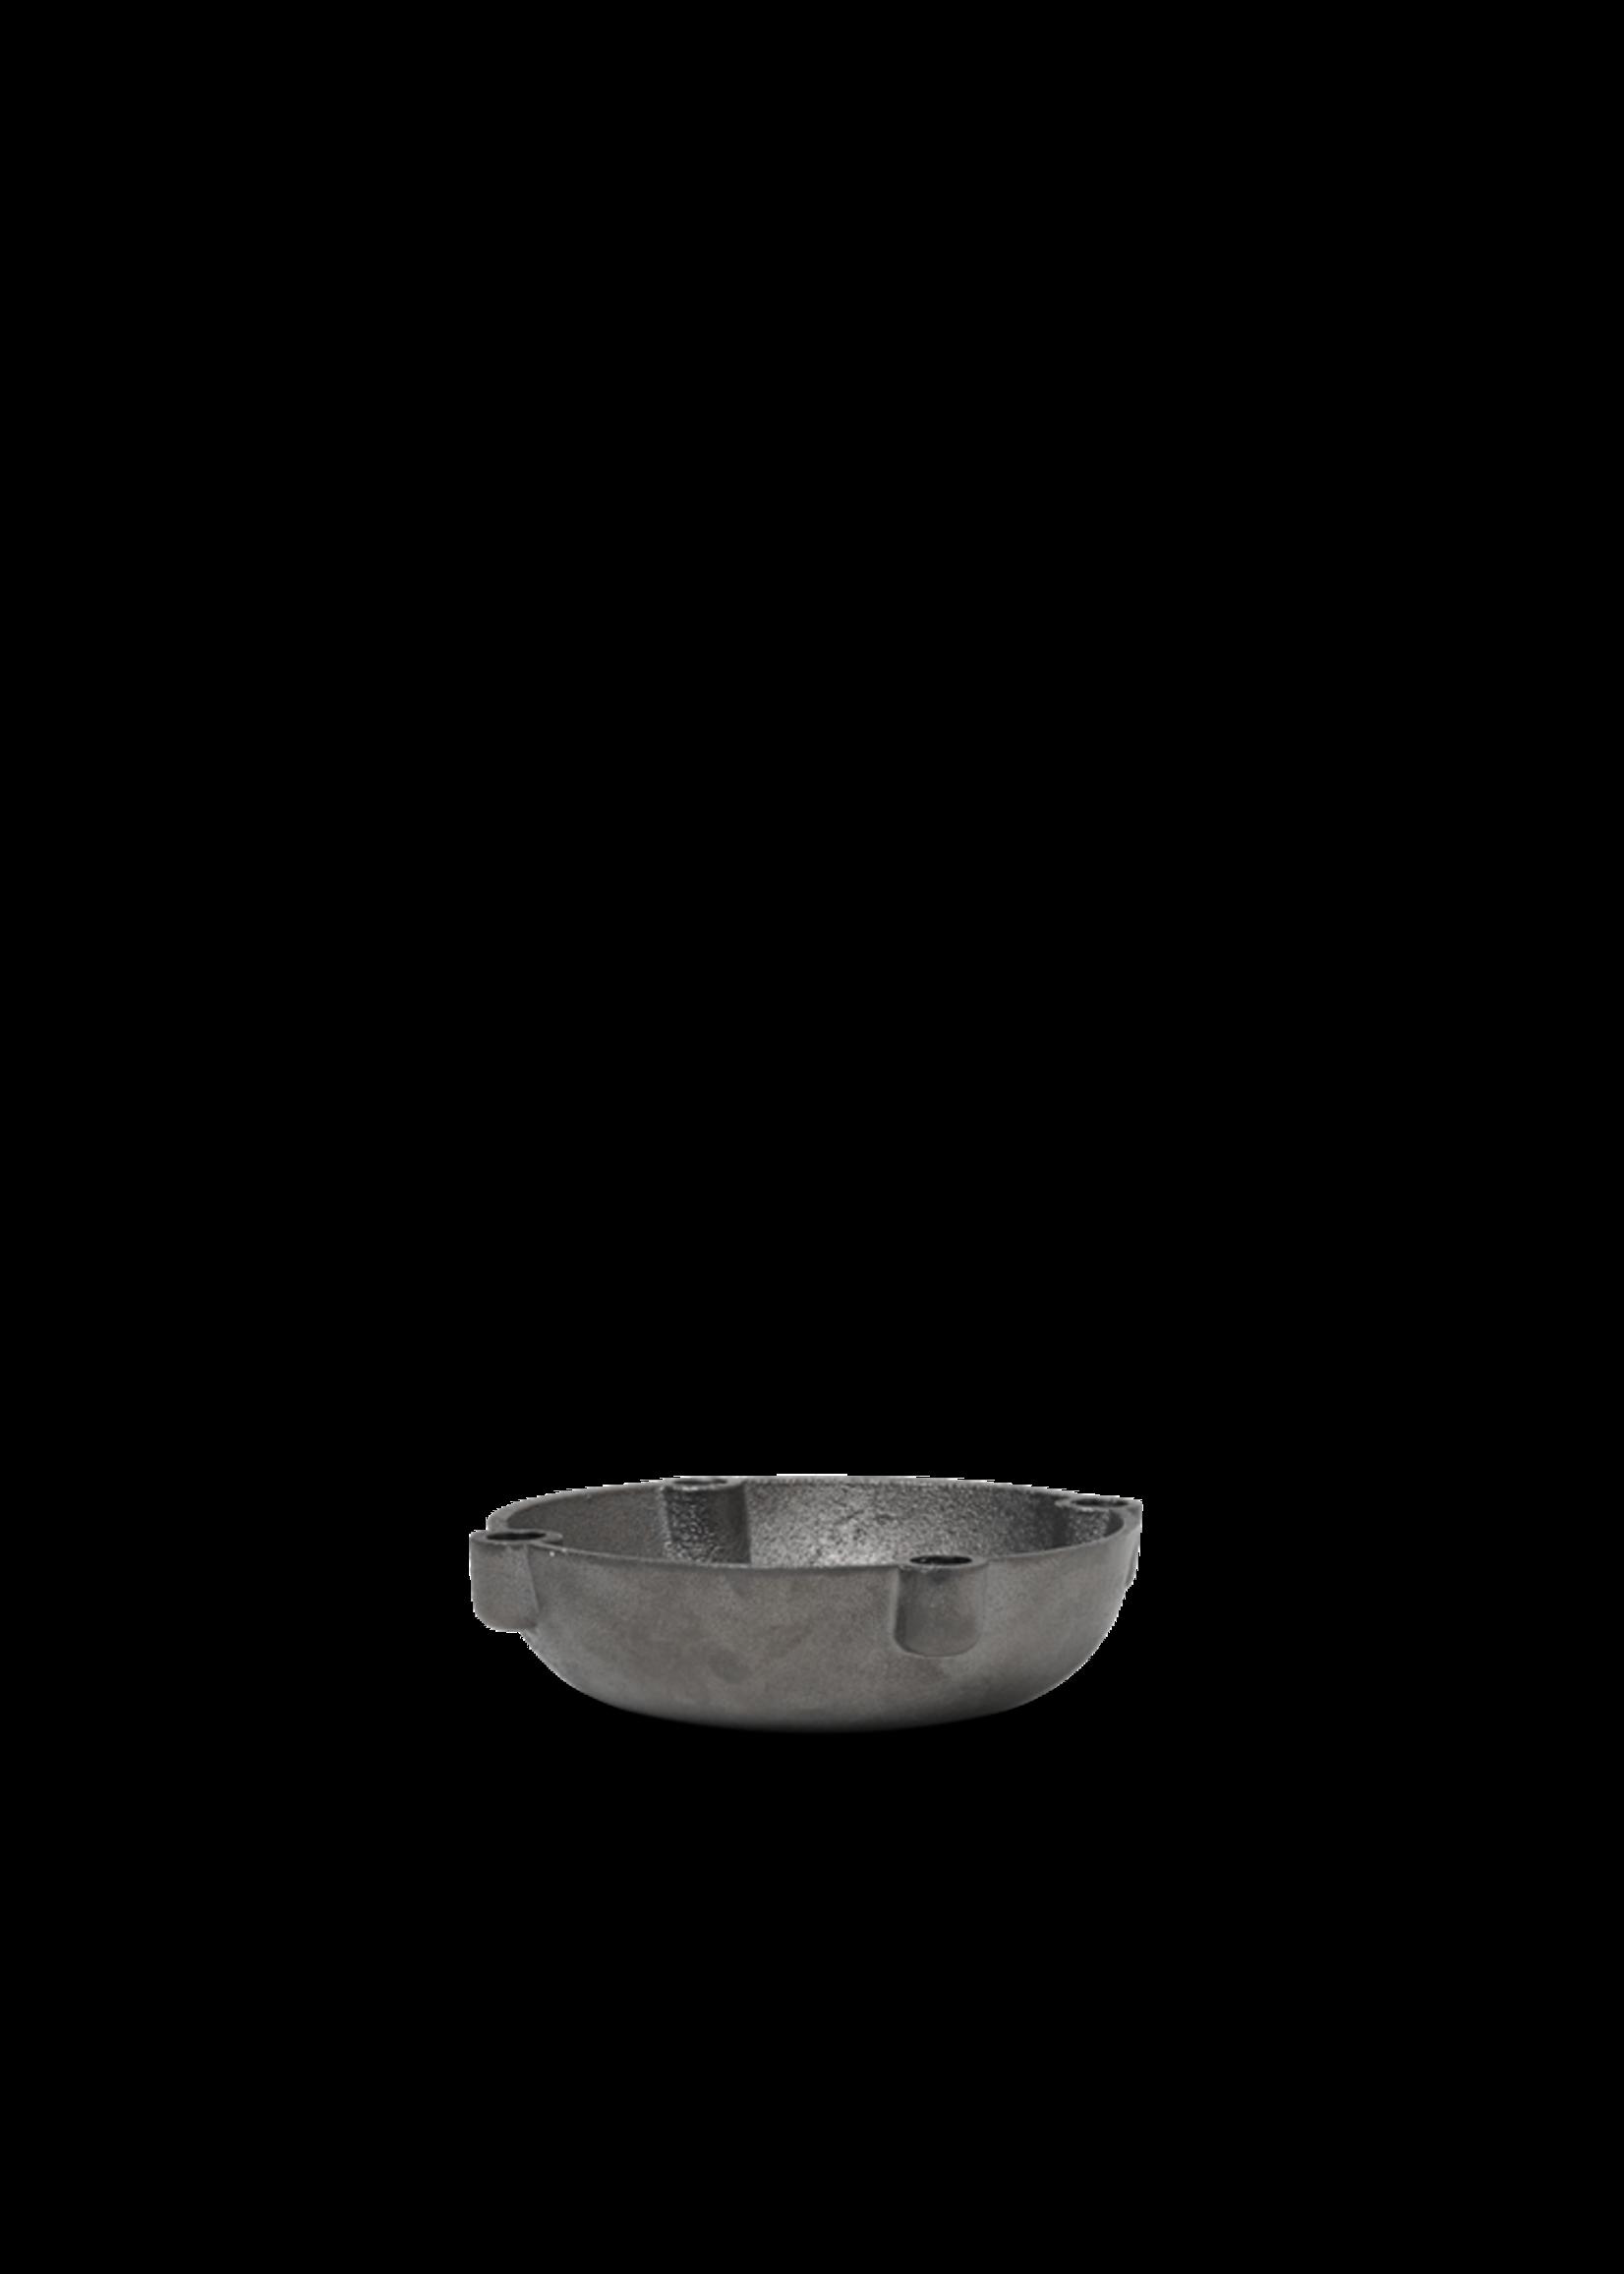 ferm LIVING Ferm Living Bowl Candle Holder - Black Brass - Small